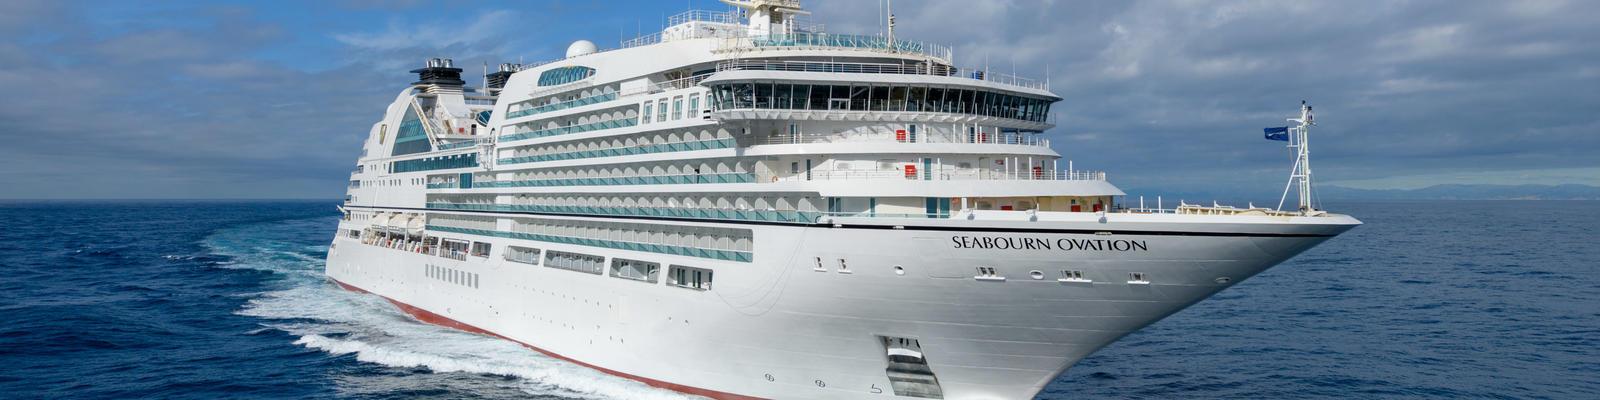 Seabourn Ovation (Photo: Seabourn Cruises)